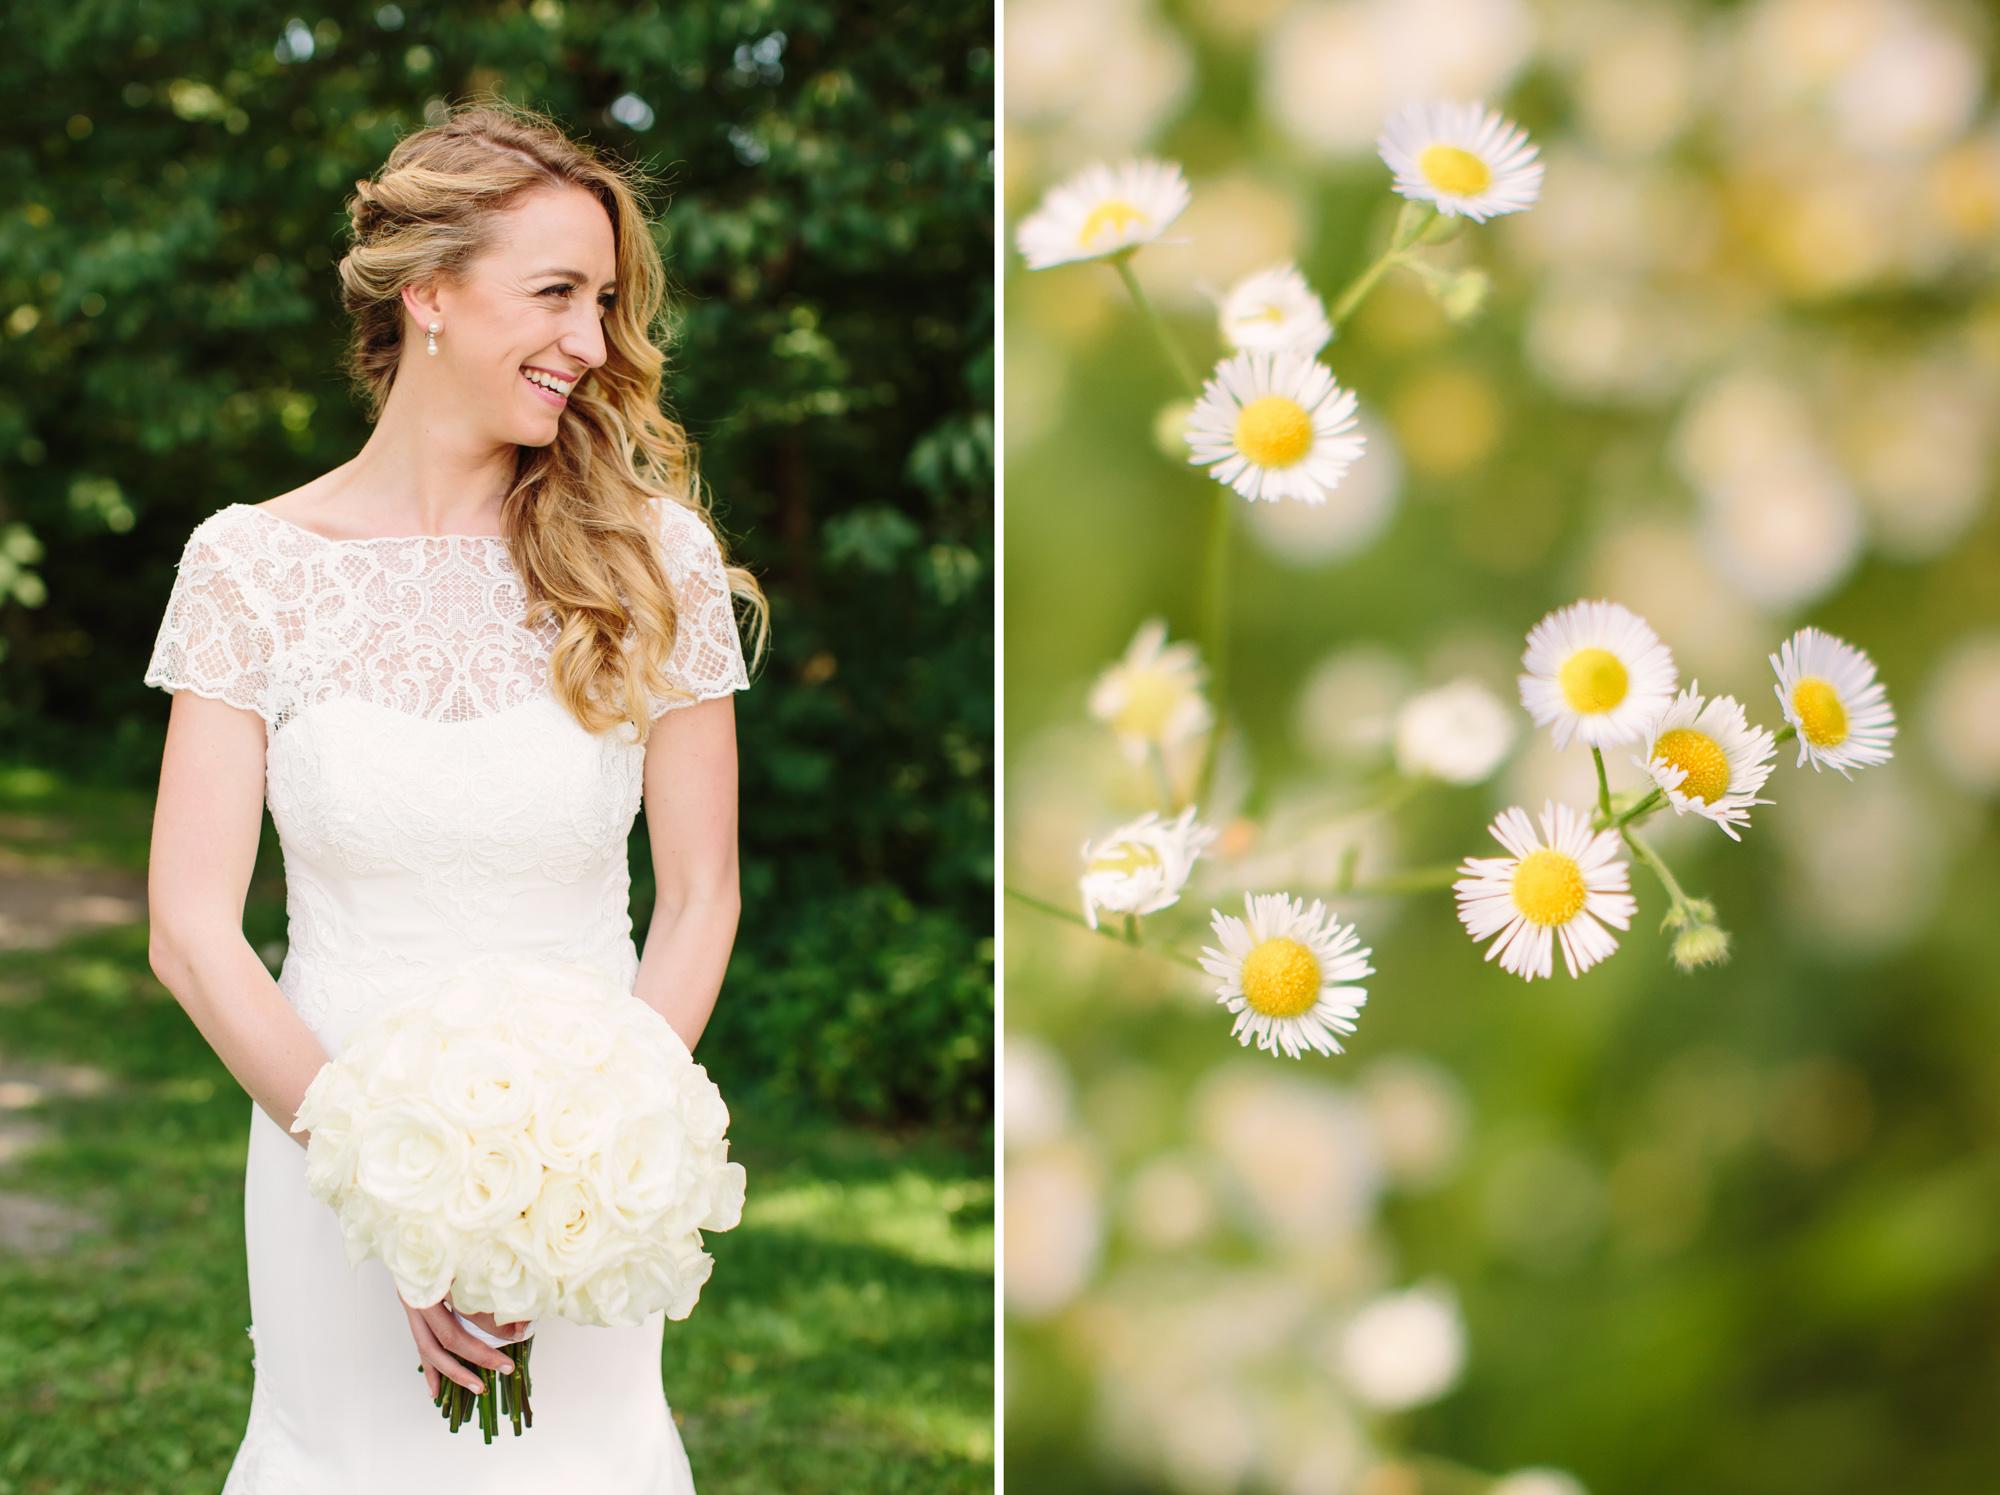 21a_Jessica_Ted_Blue_Hill_Stone_Barns_Wedding_Pocantico_NY_Tanya_Salazar_Photography.jpg